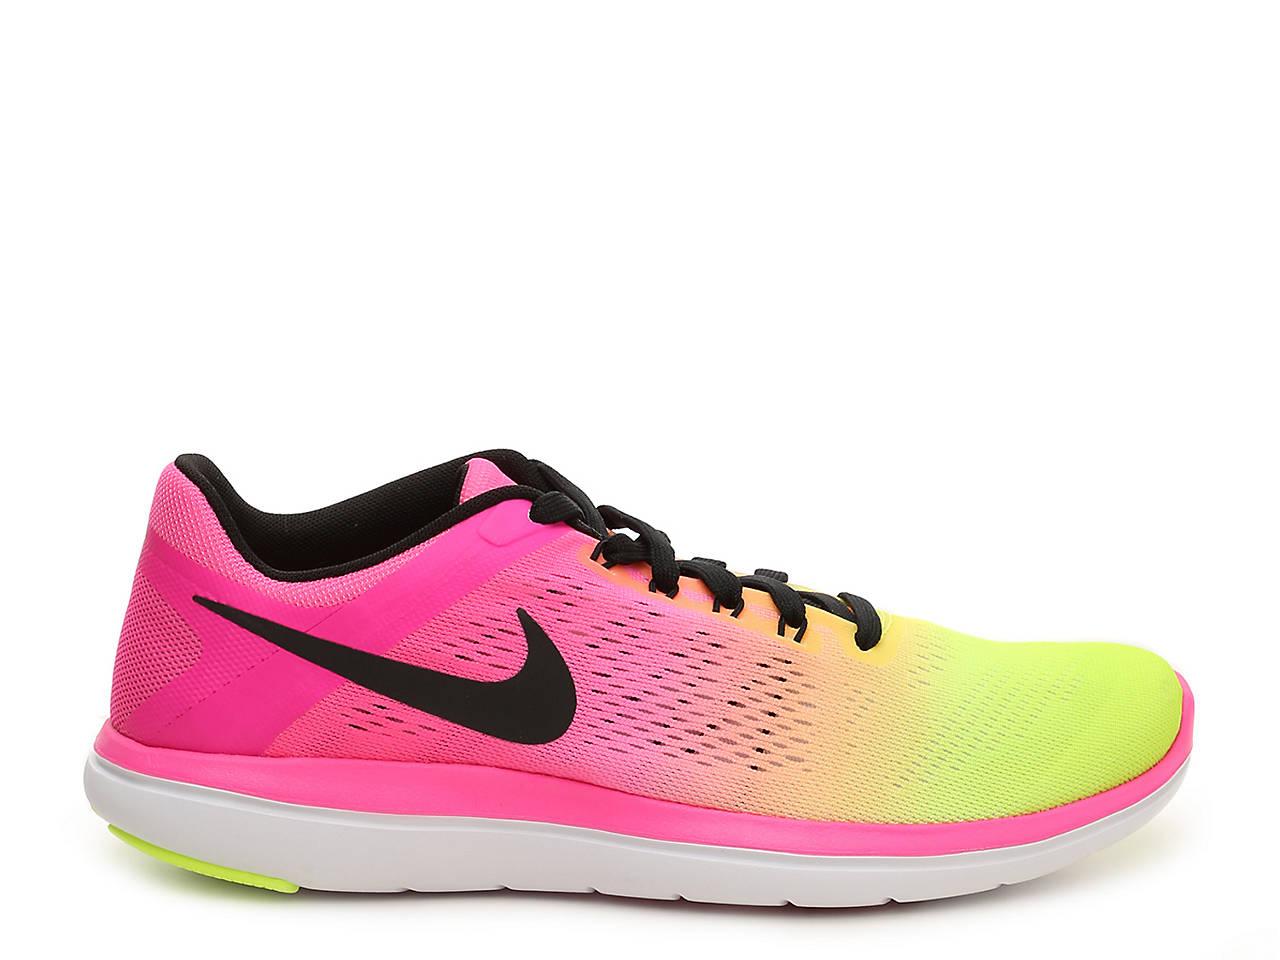 los angeles 5a3cc 3cbee ... free trainer 5.0 cross training shoes size 6 Nike Flex 2016 RN OC ...